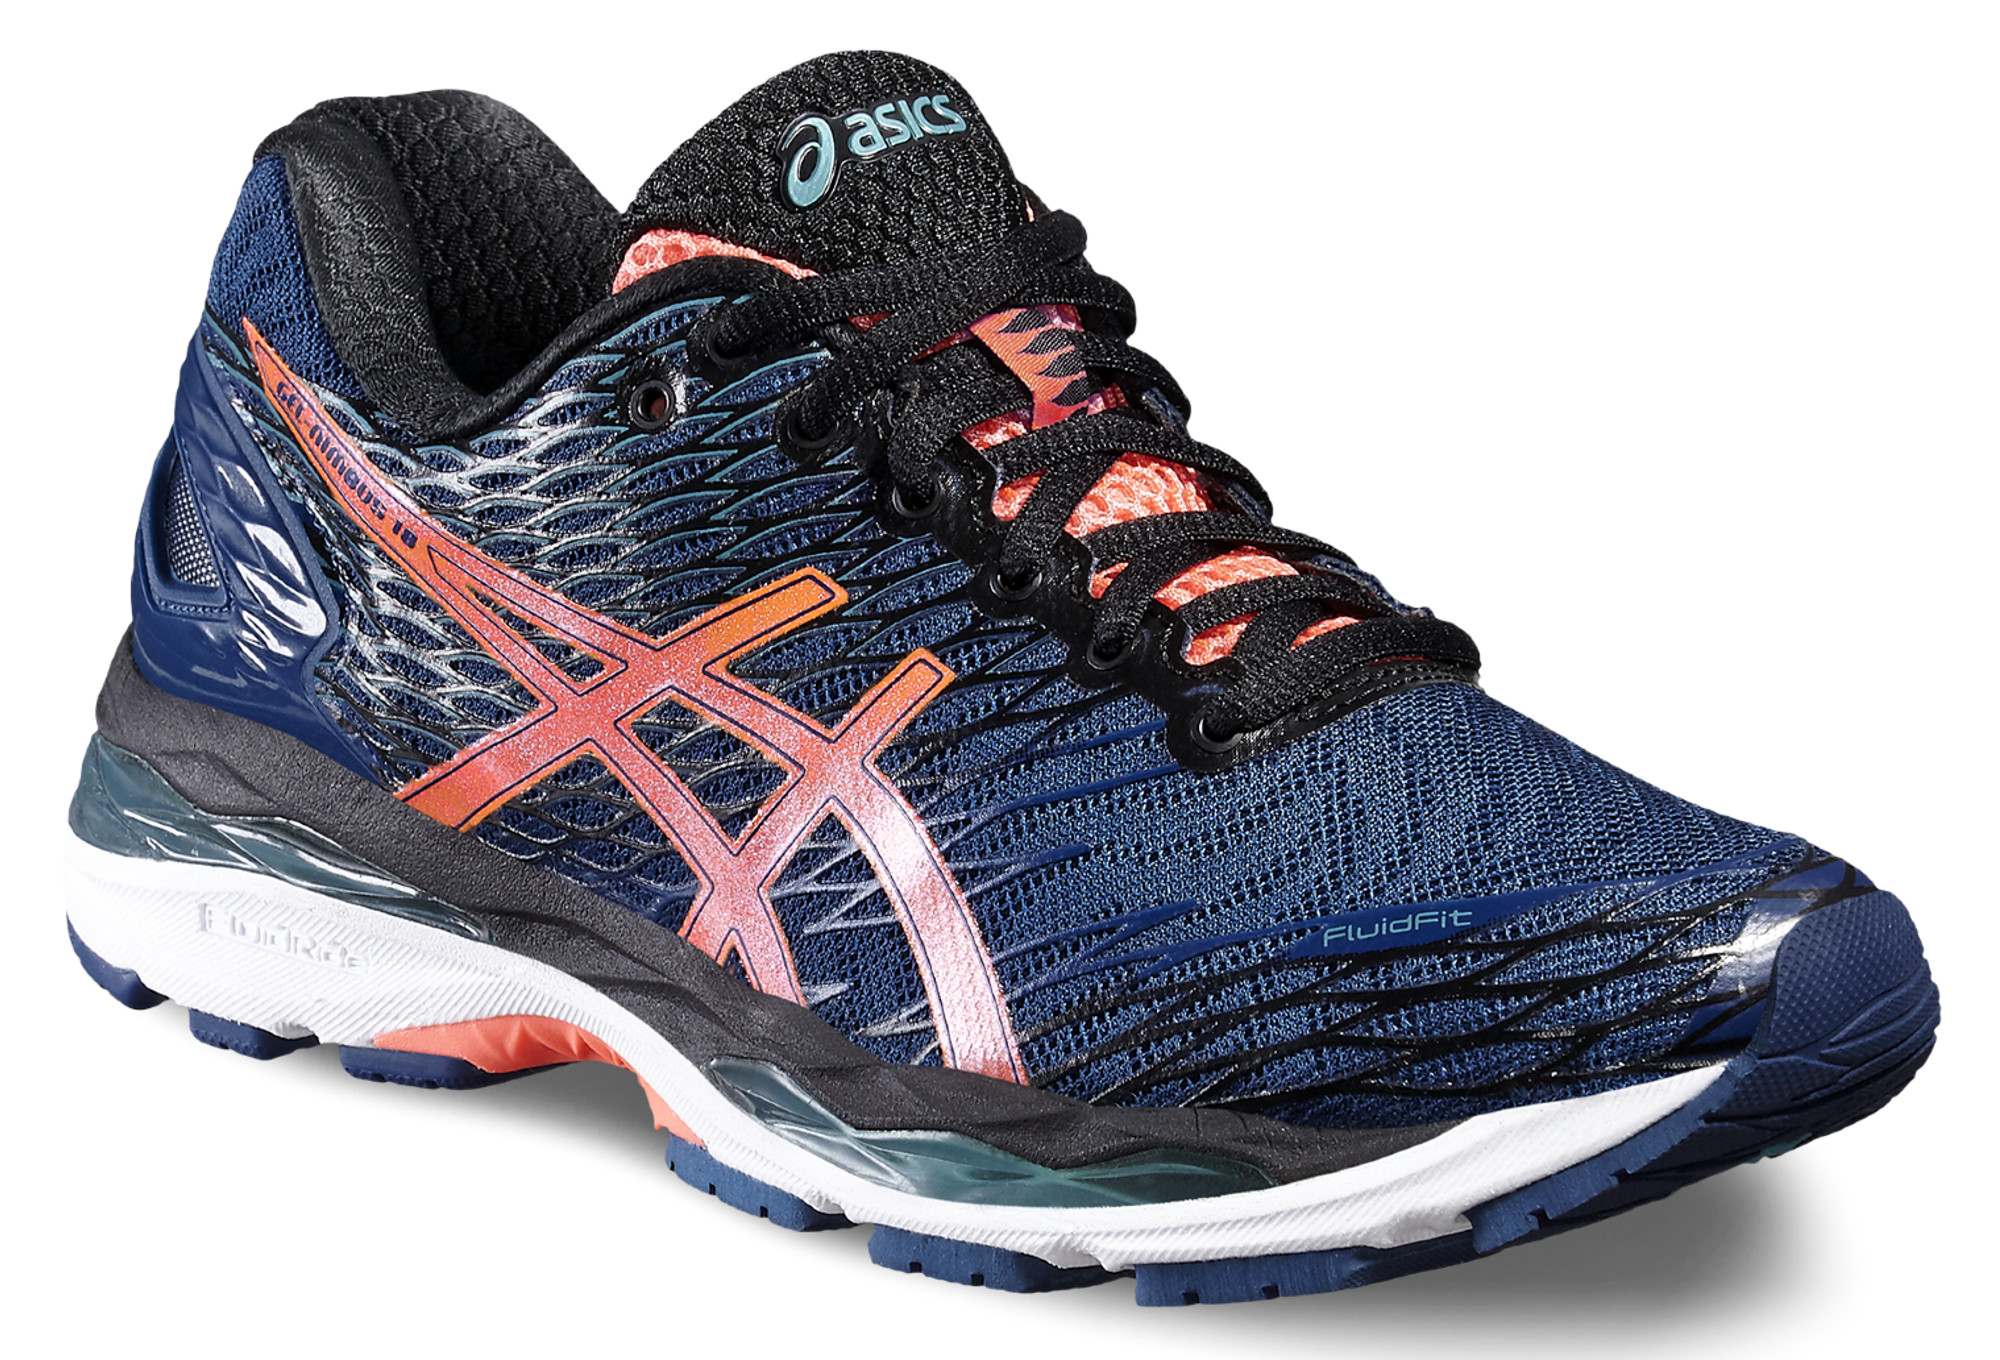 Chaussures running homme asics gel nimbus 18 bleu/orange asics